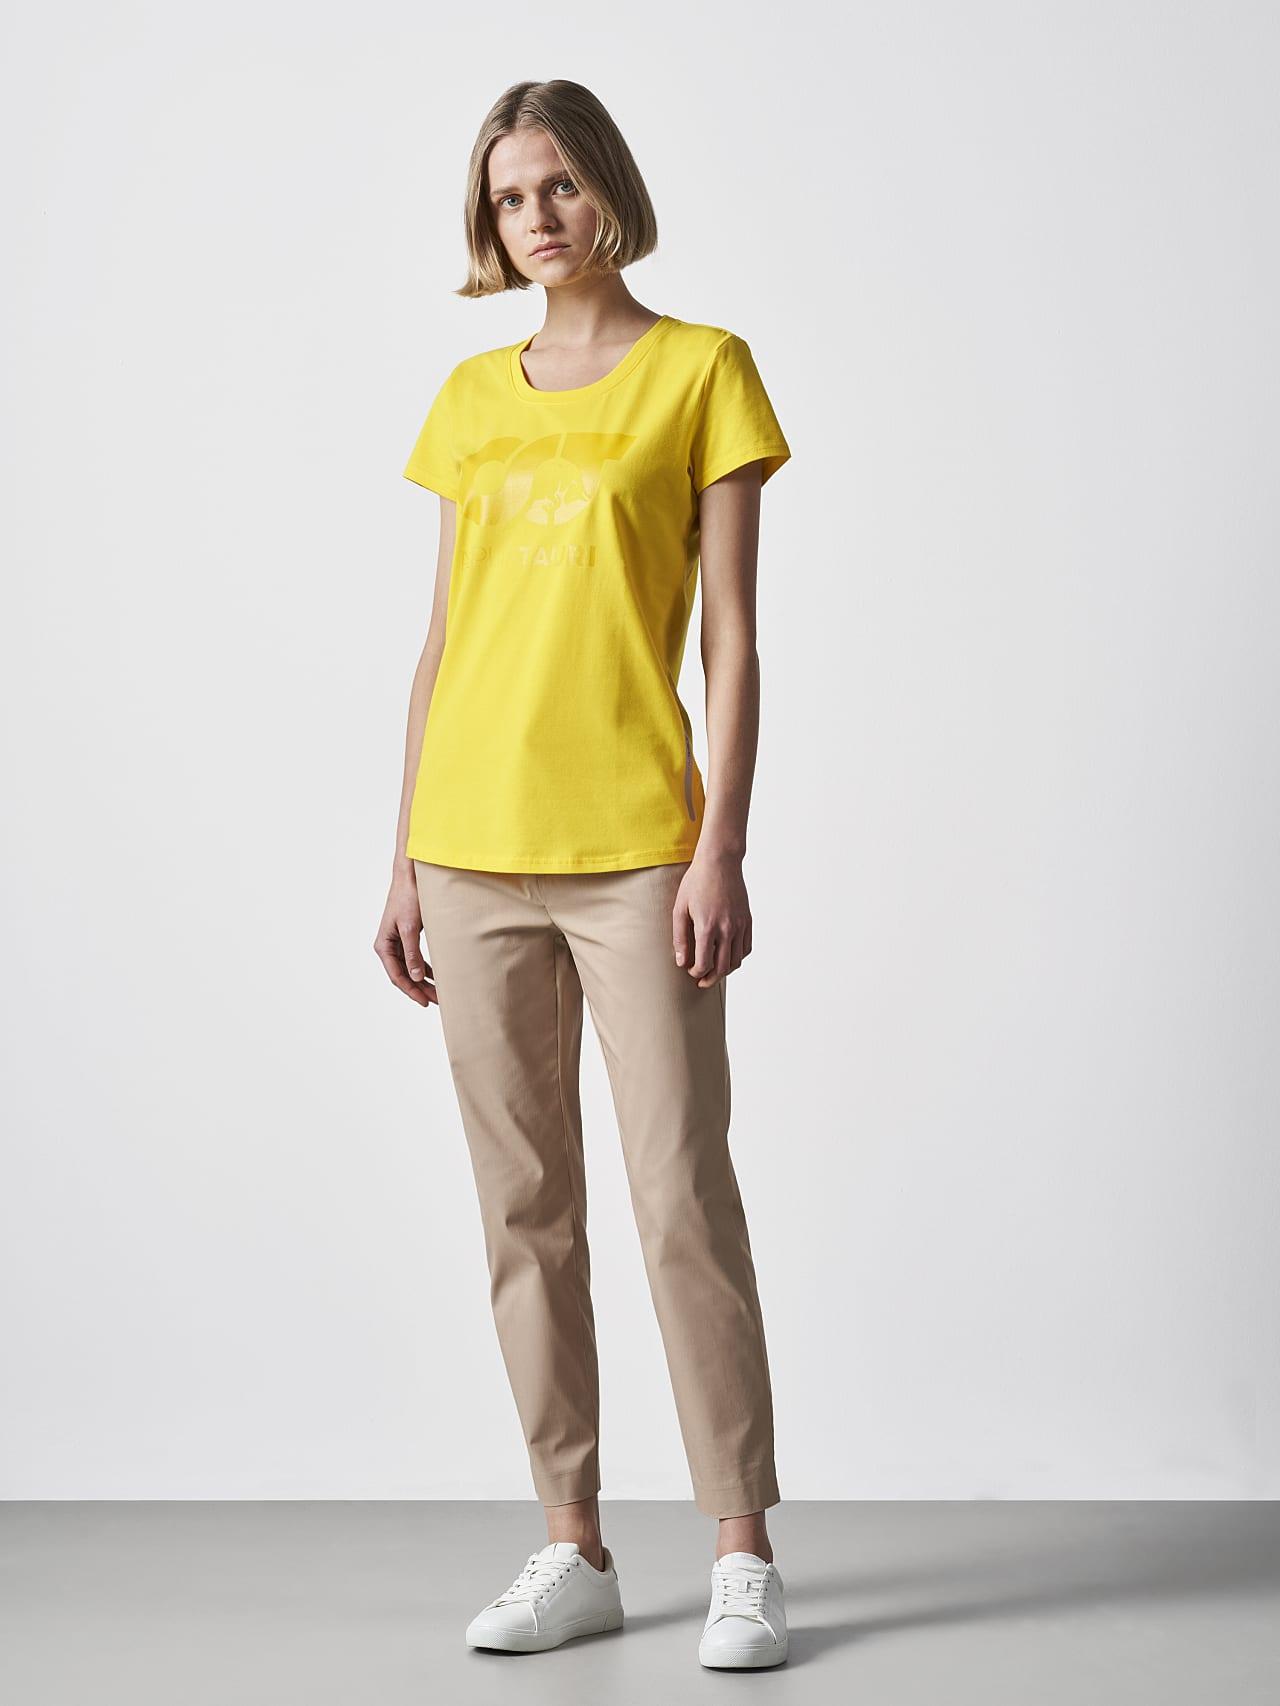 JERU V2.Y4.02 Signature Logo T-Shirt yellow Front Alpha Tauri